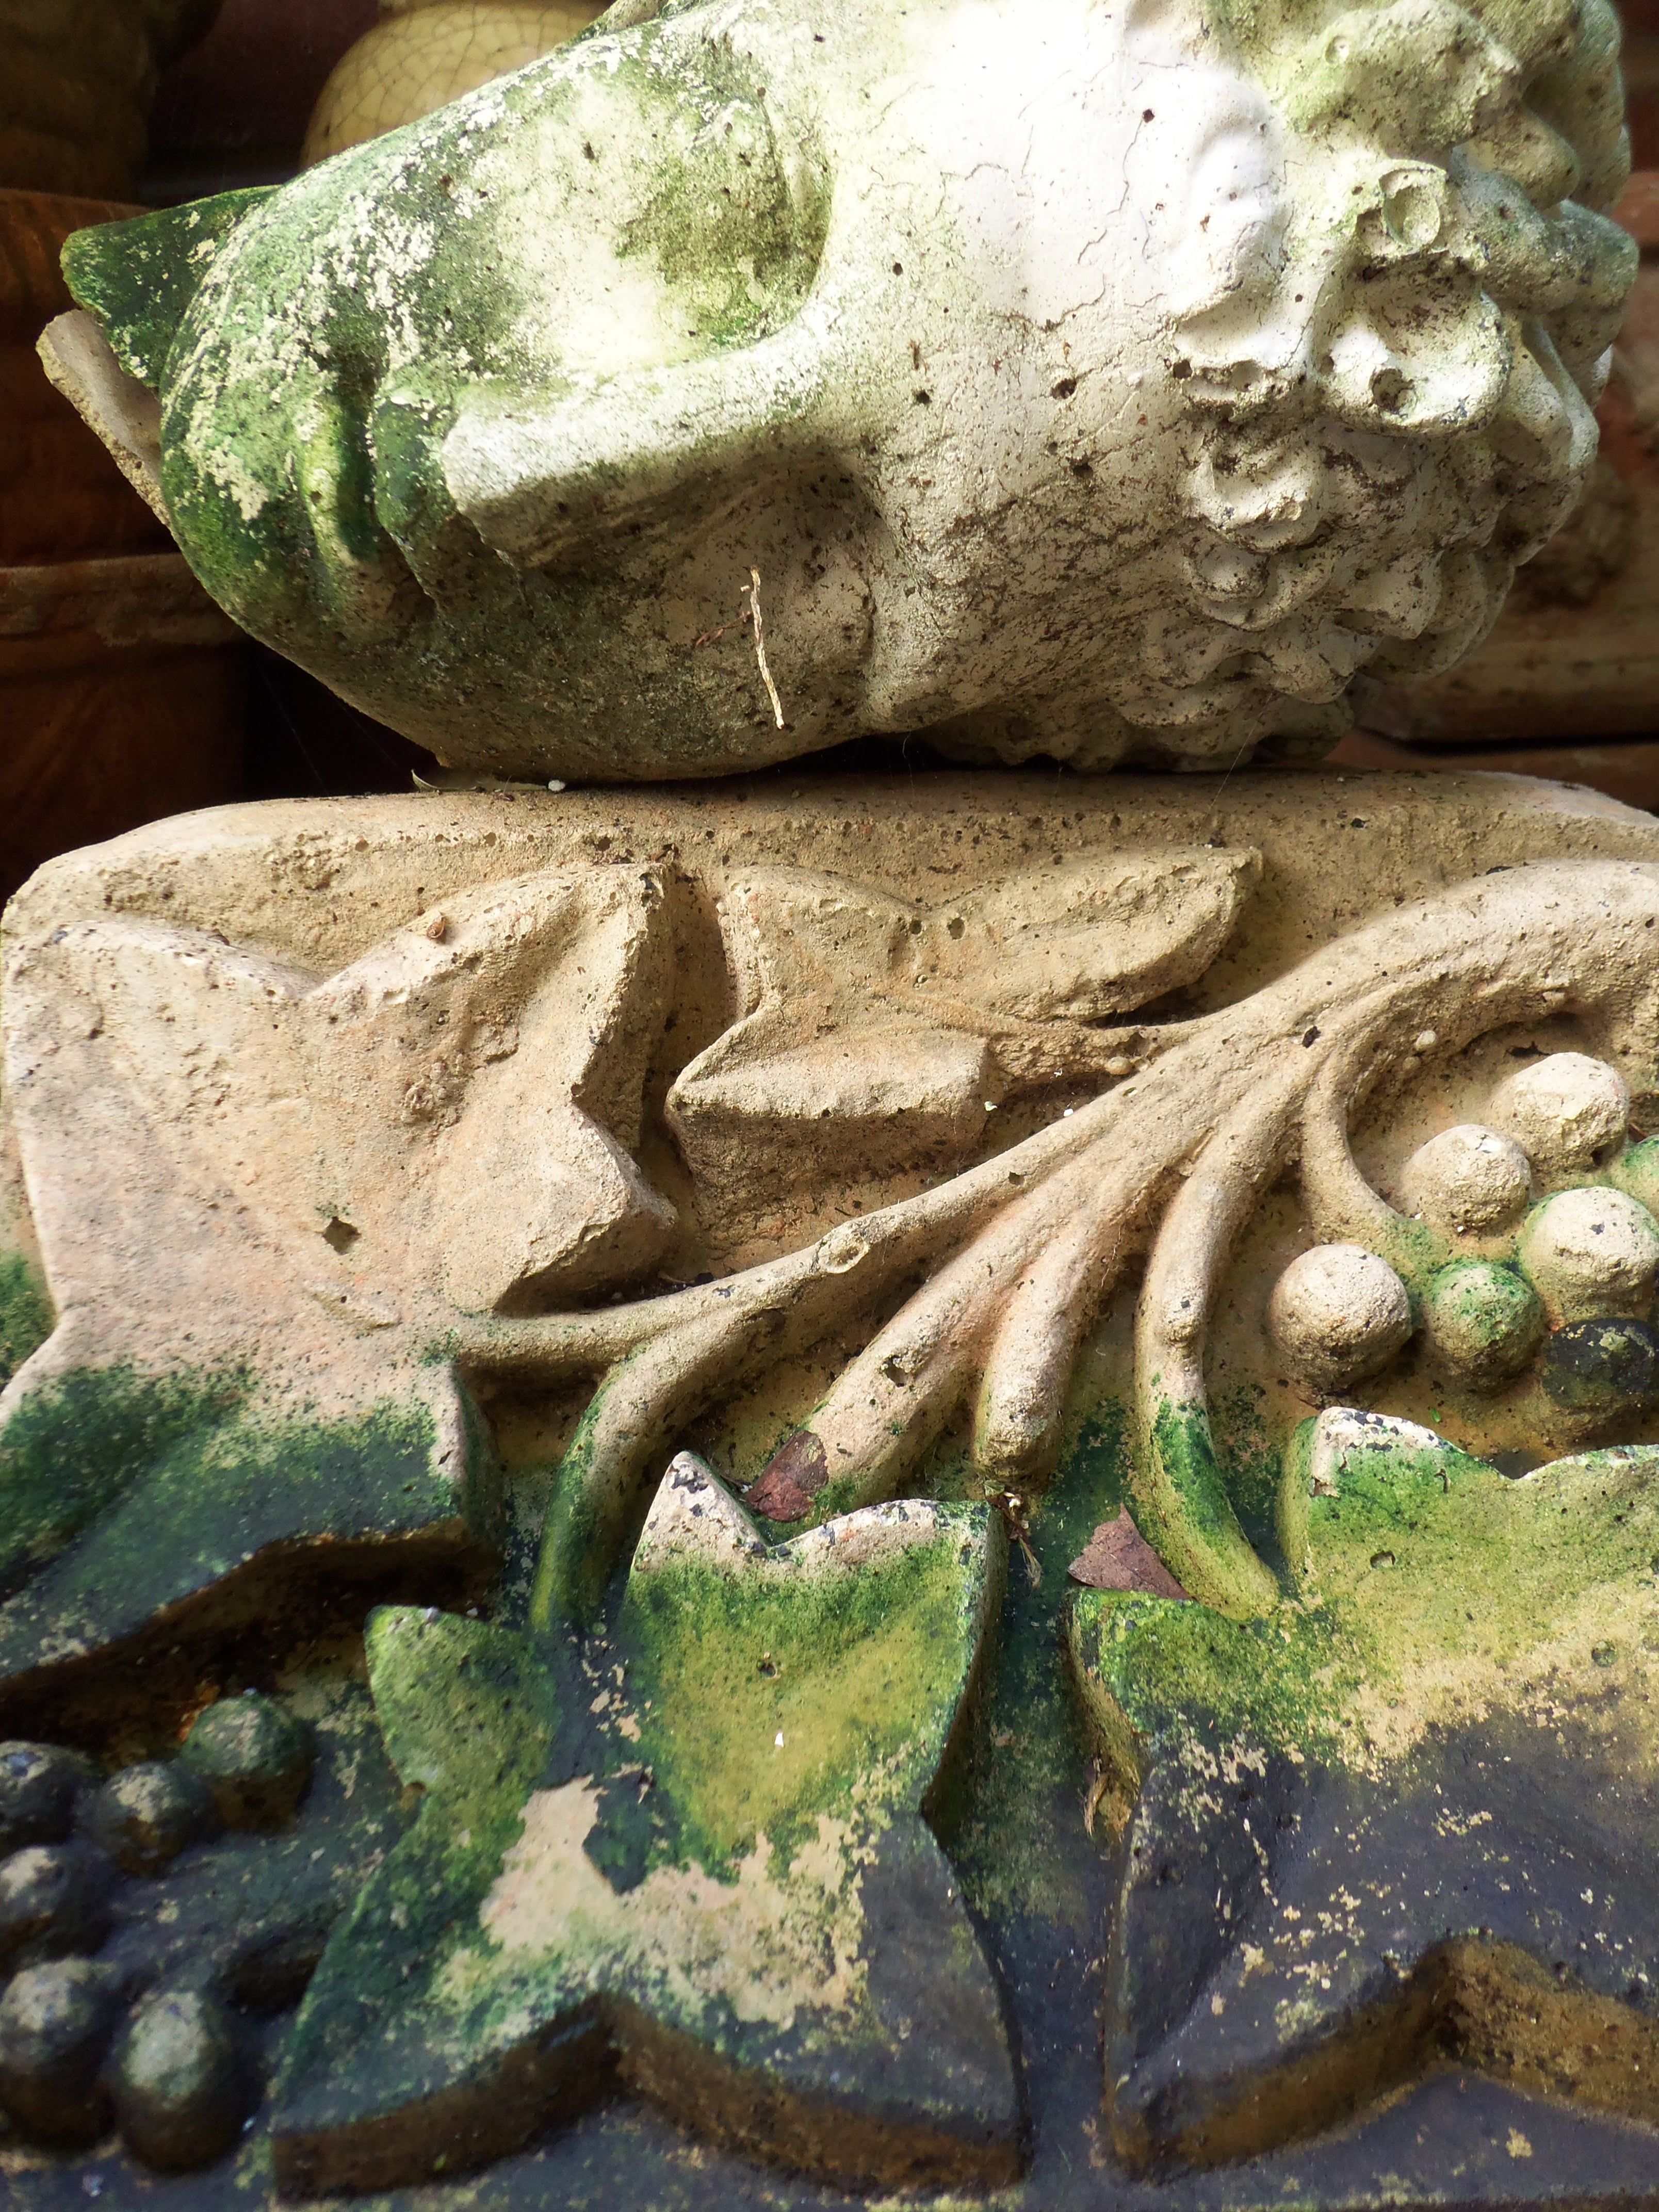 cement garden decor by unpotpourri . see our etsy shop www.etsy.com ...